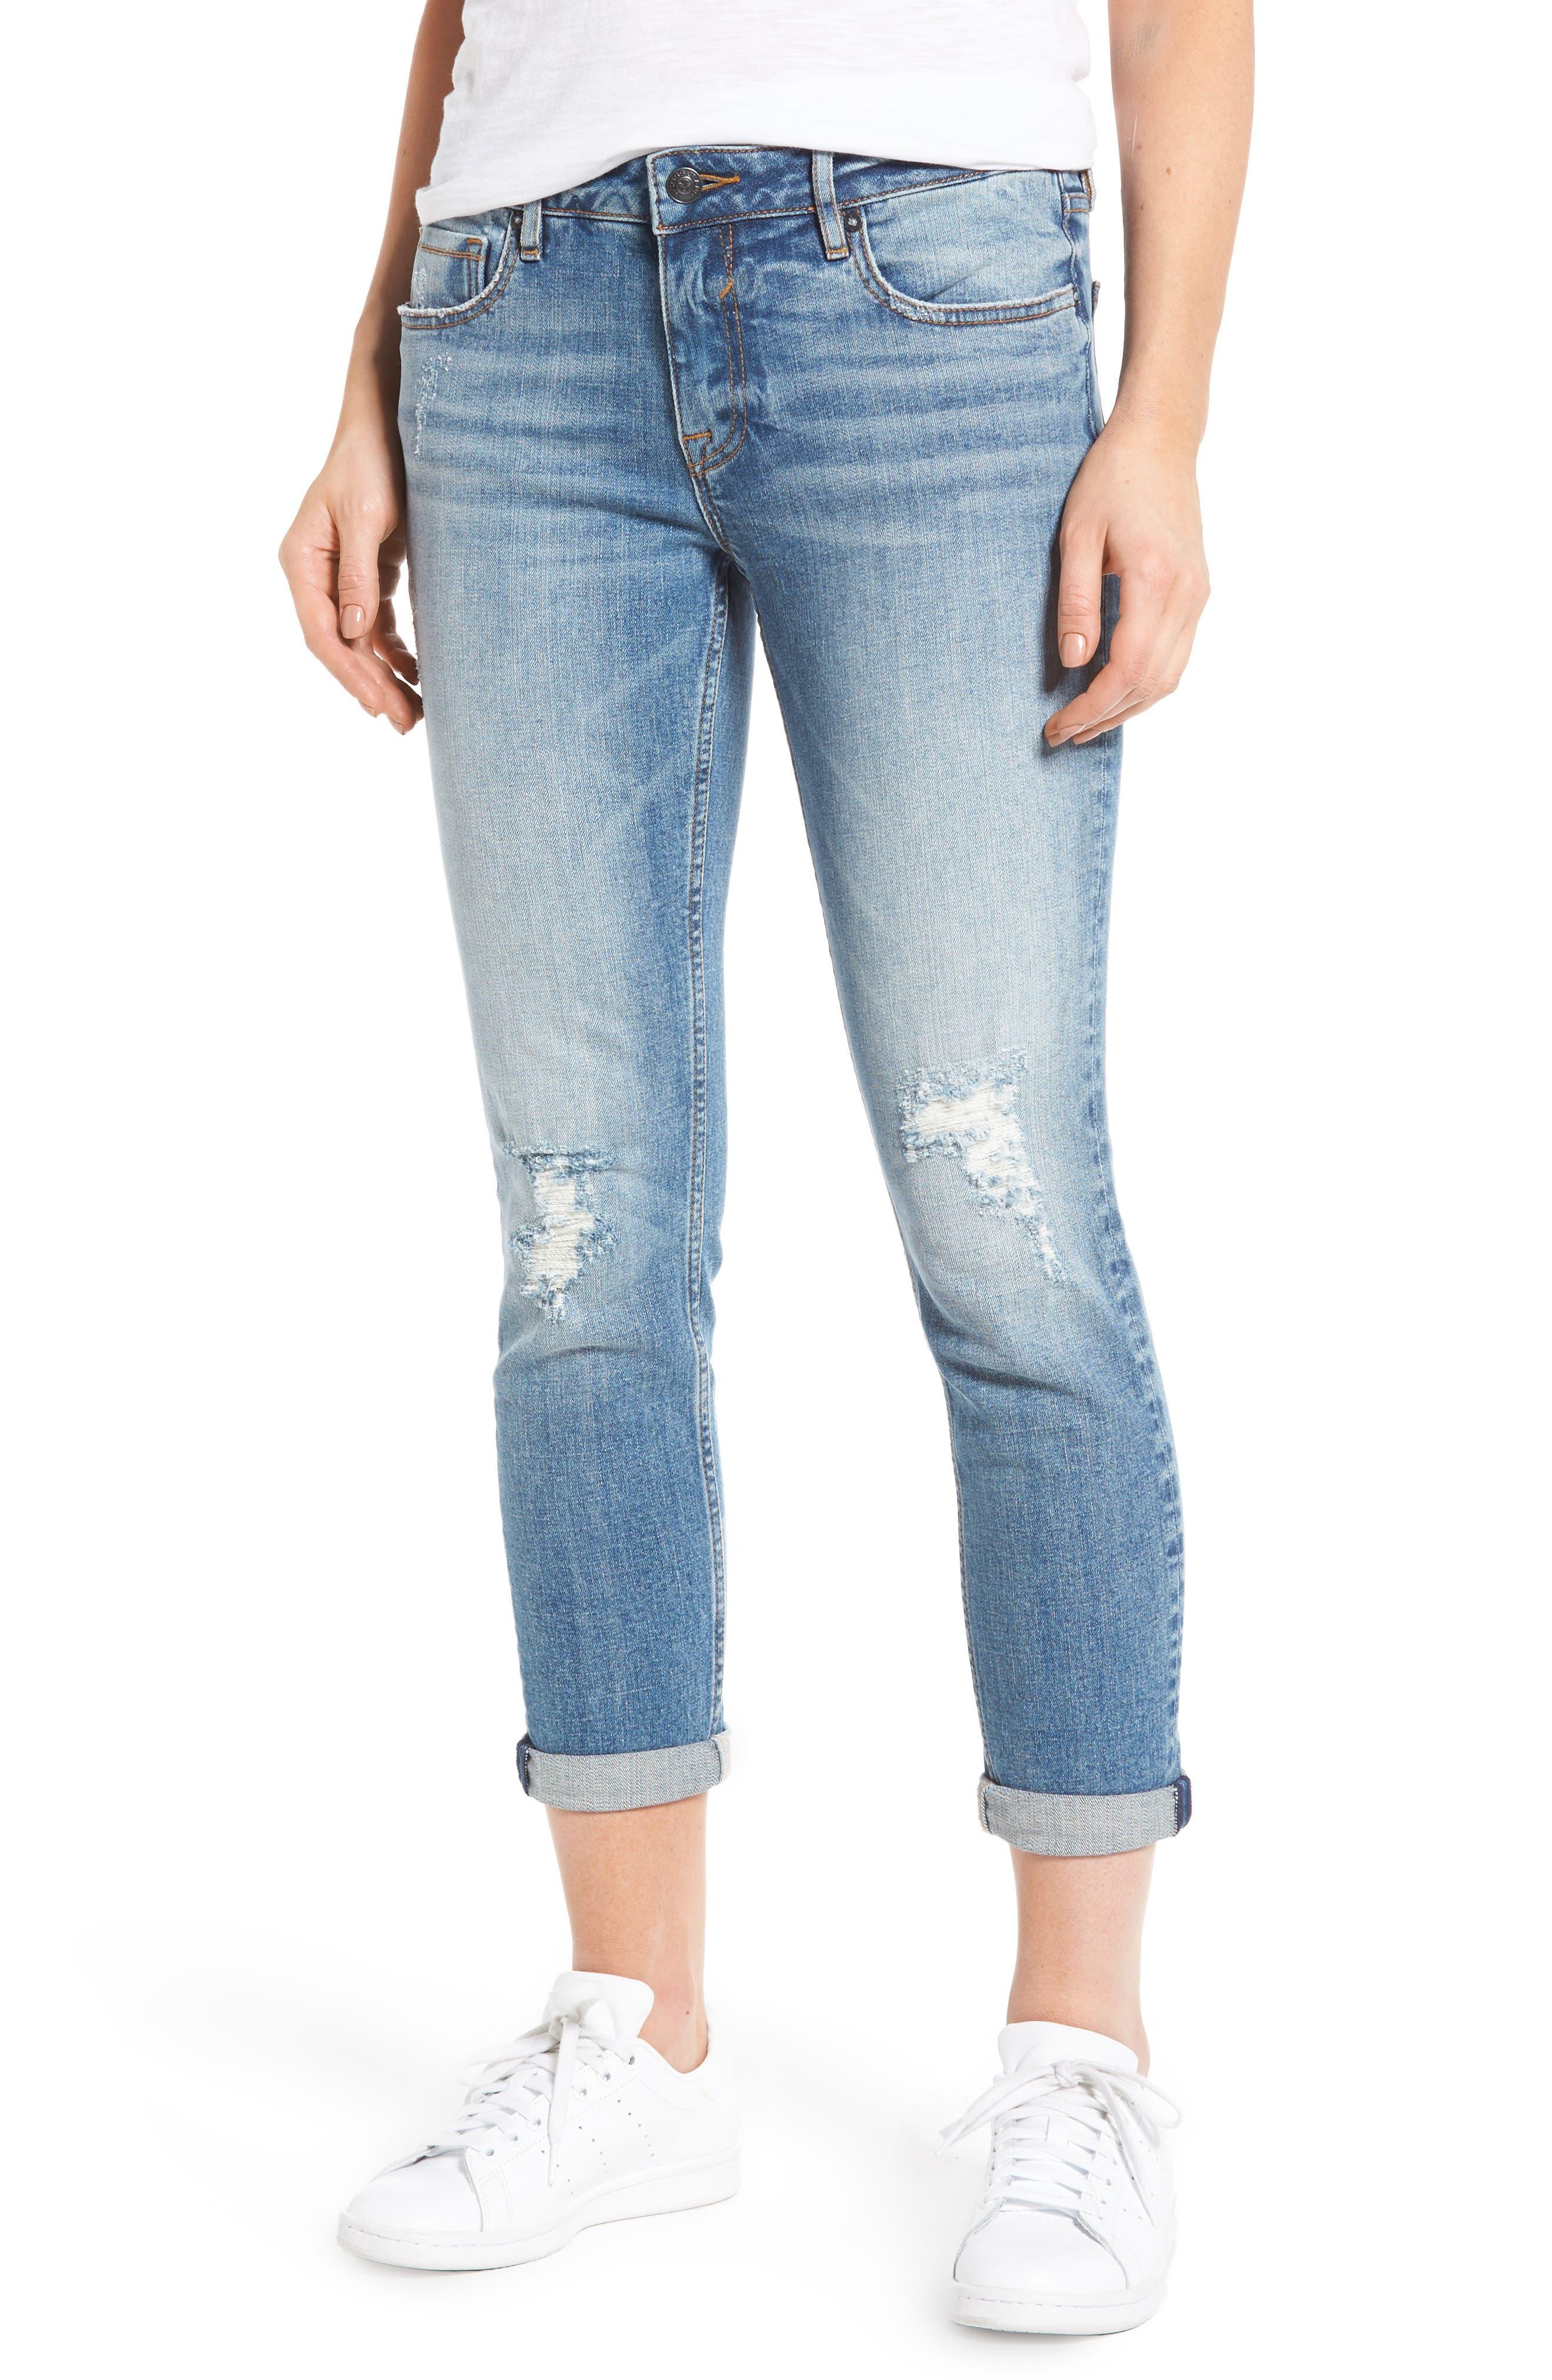 Vigoss Tomboy Ripped Skinny Jeans